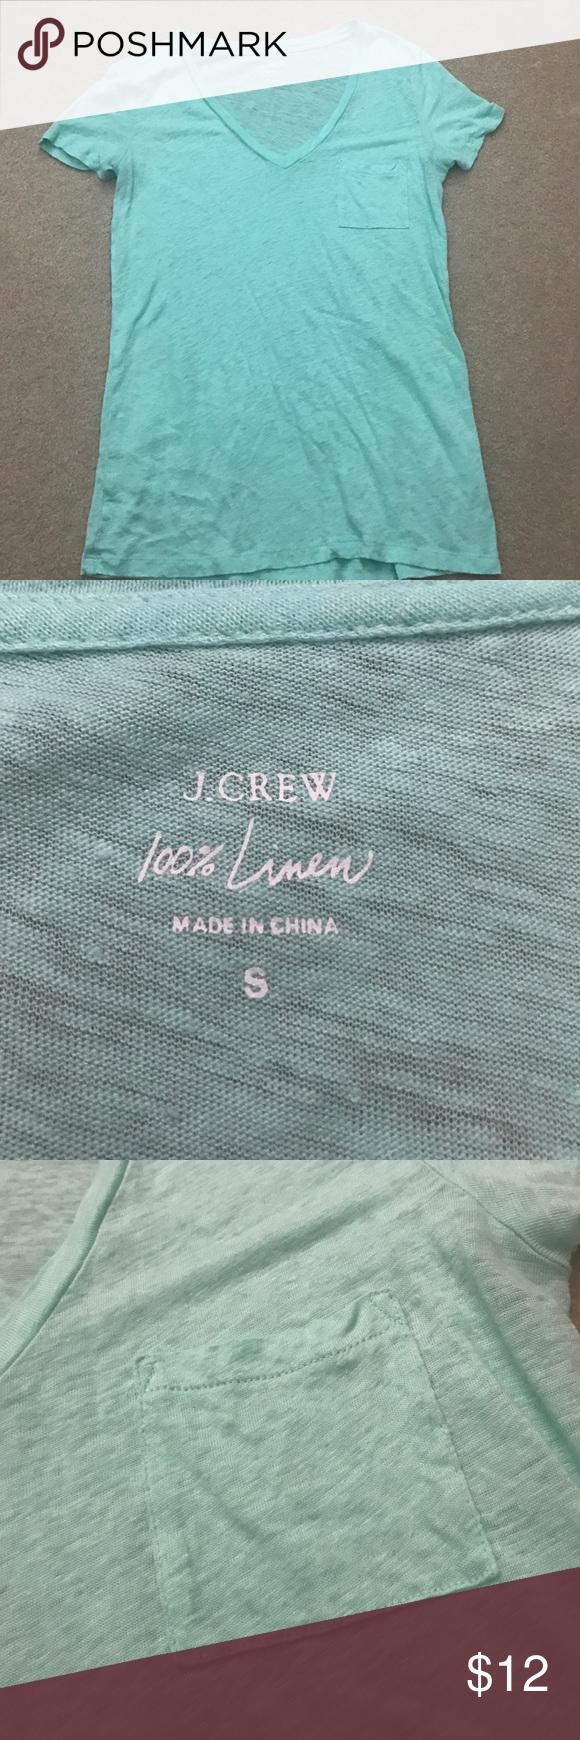 J crew linen tee Perfect condition! Jcrew aqua colored linen short sleeve tee! J. Crew Tops Tees - Short Sleeve